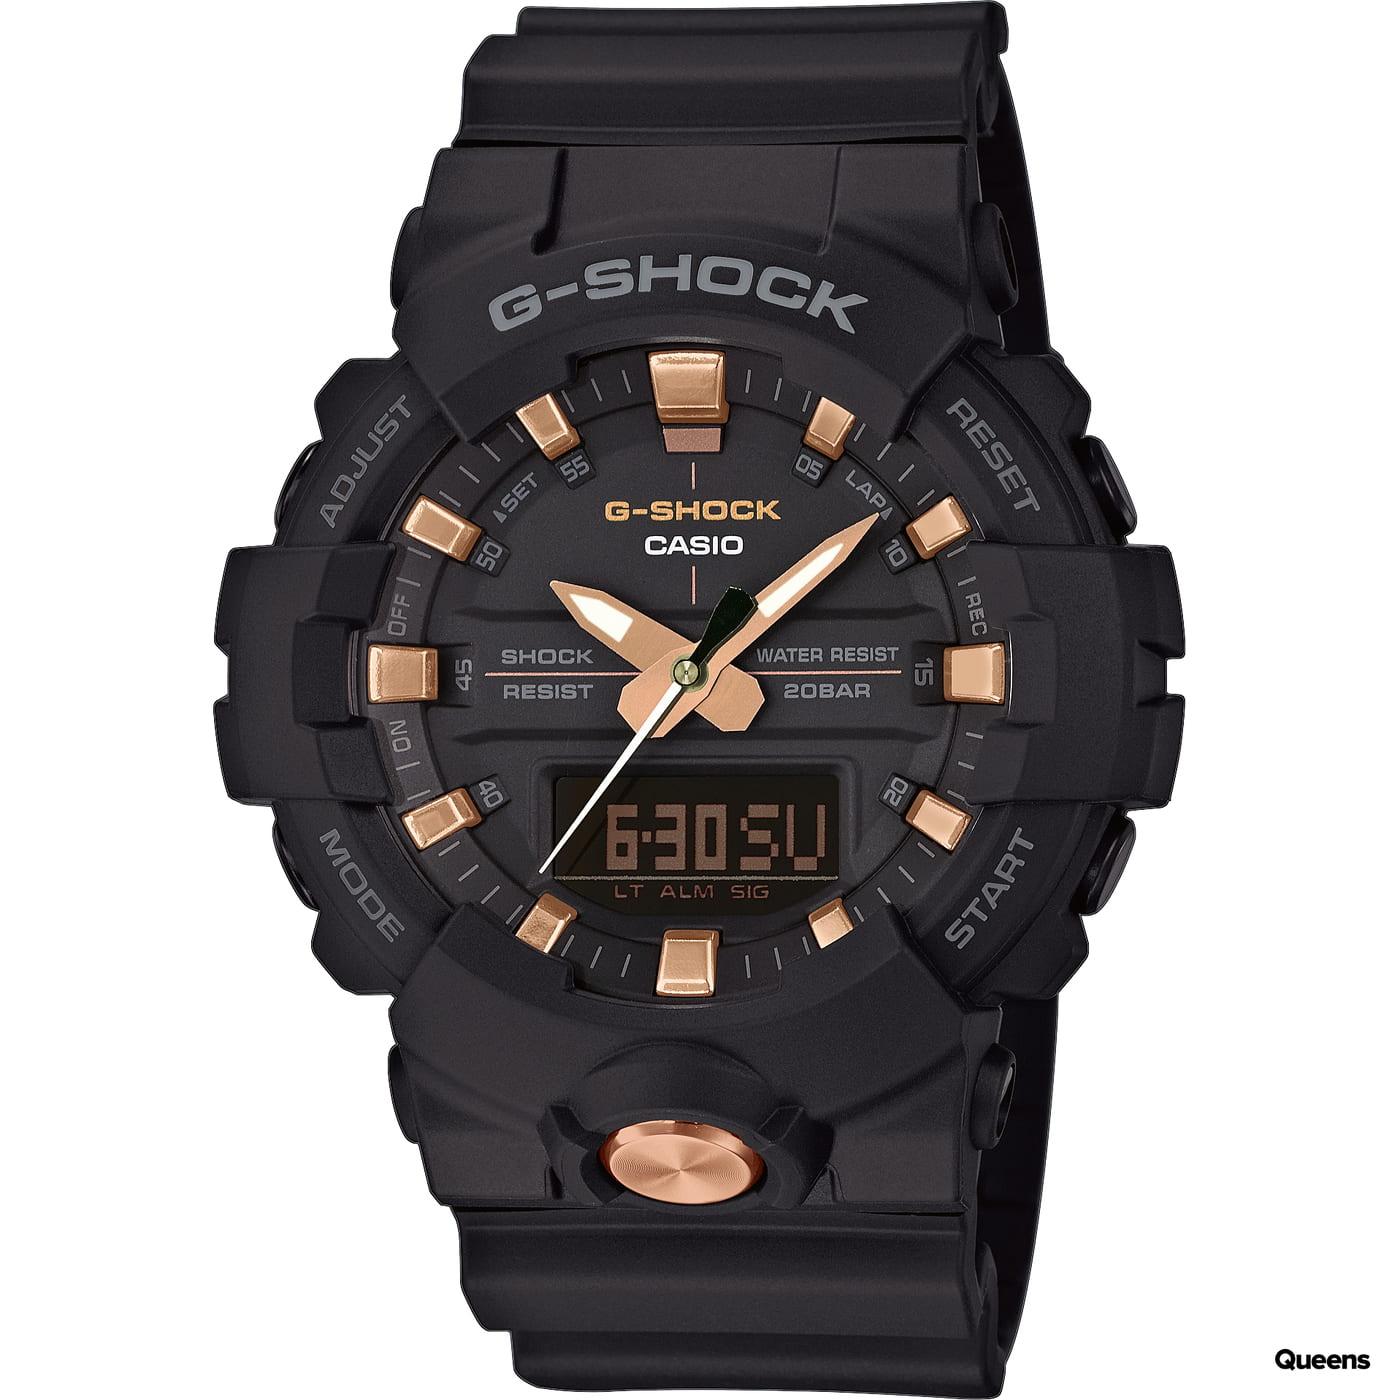 Casio G-Shock GA 810B-1A4ER černé